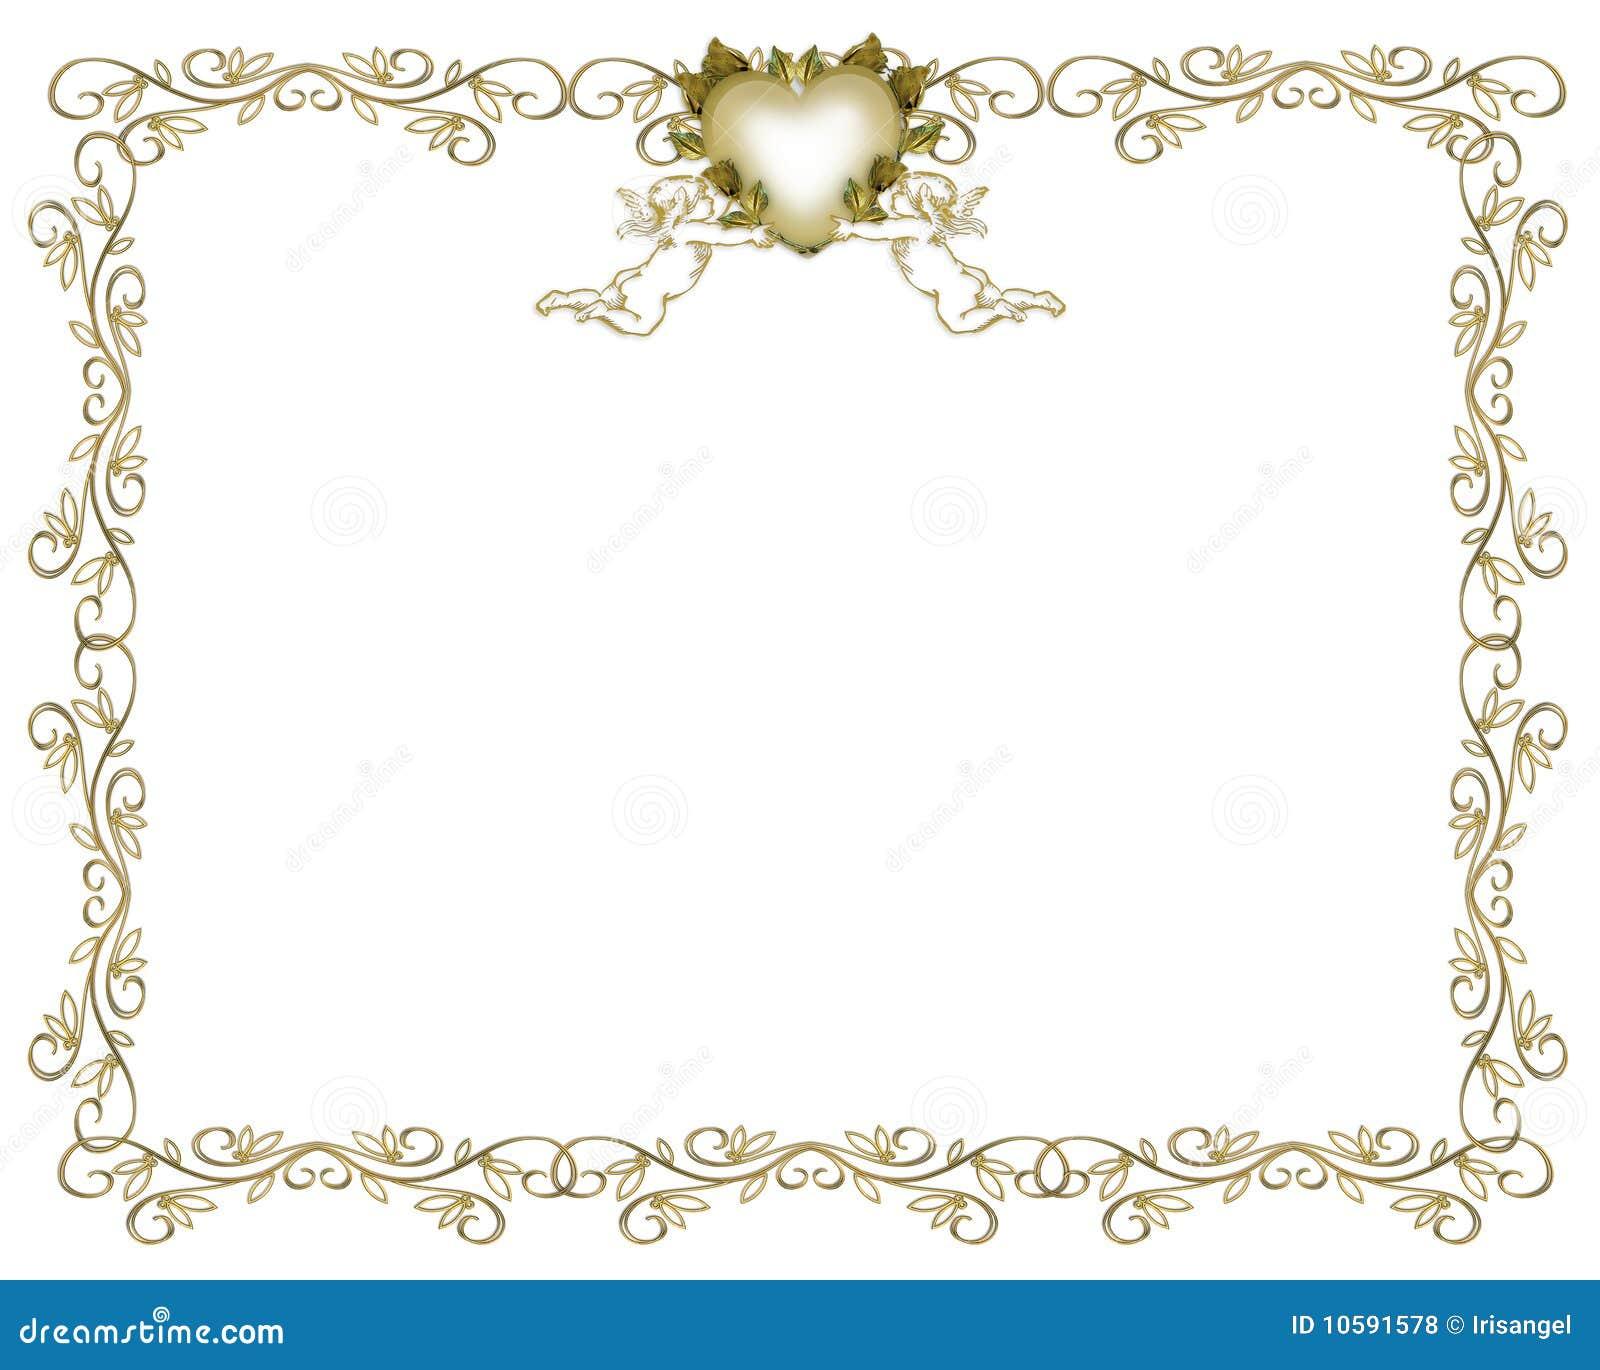 Wedding Invitation Gold Border Angels